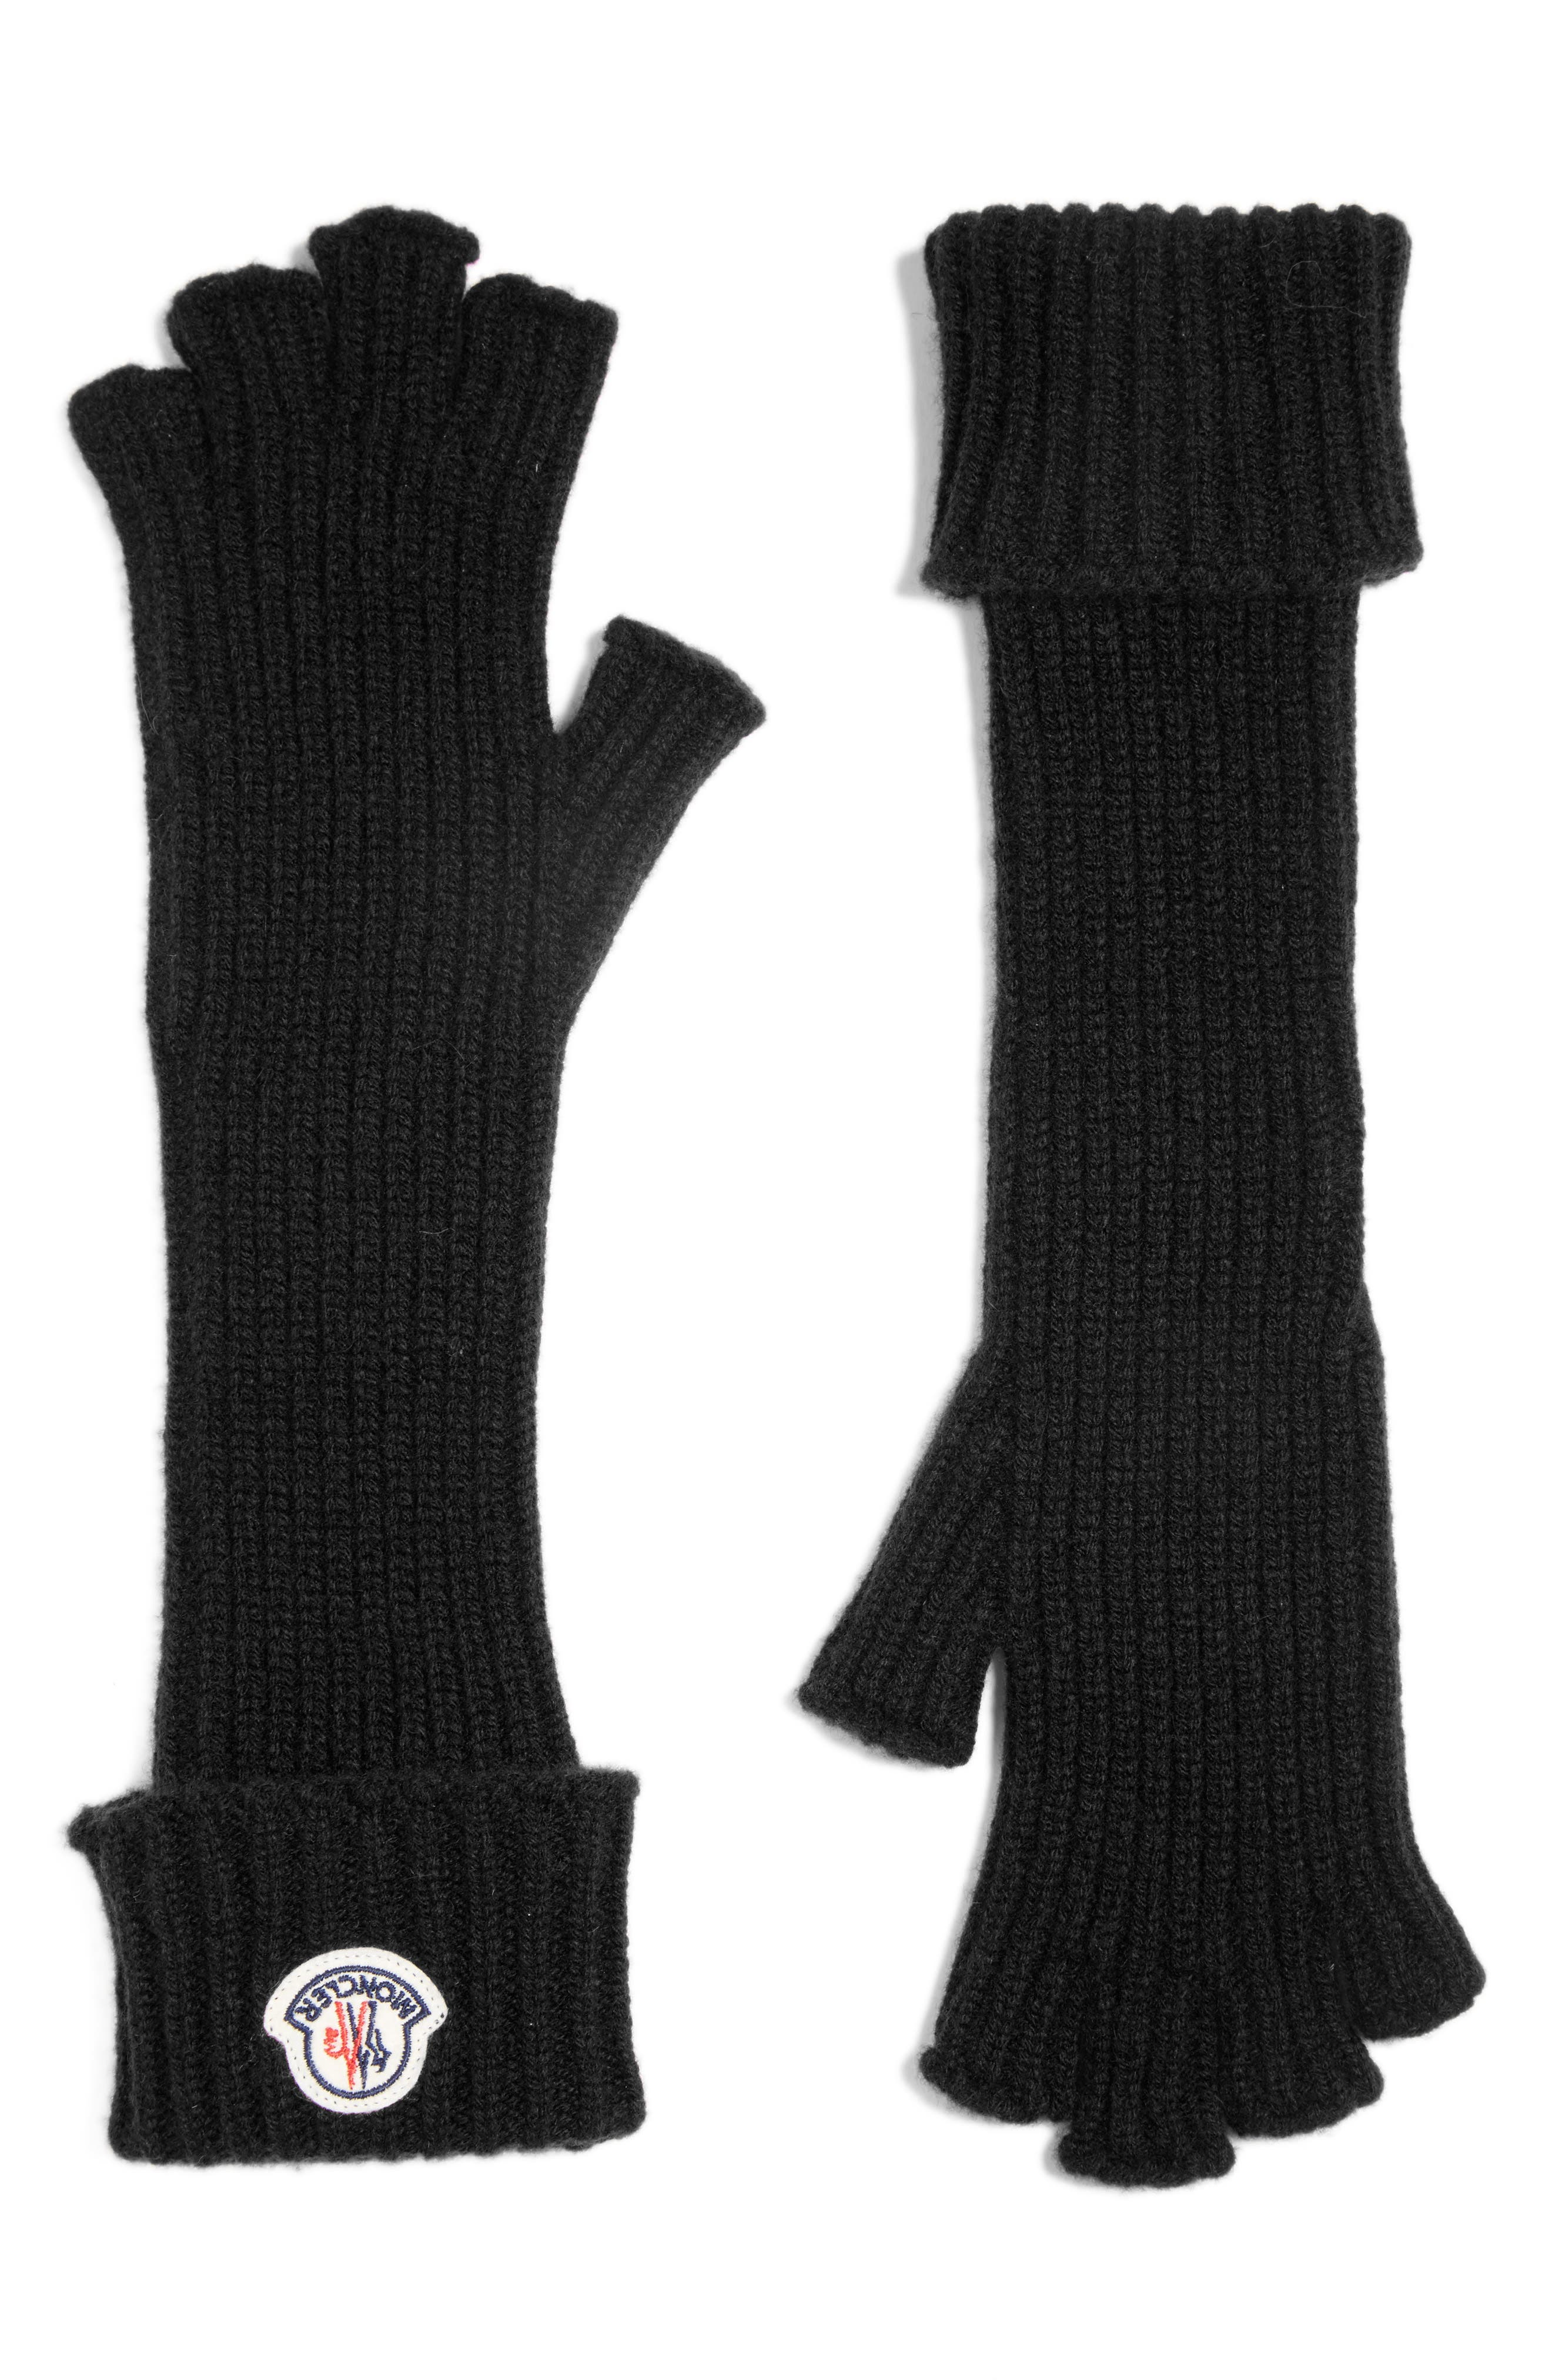 Guanti Wool & Cashmere Long Fingerless Gloves,                             Alternate thumbnail 2, color,                             001